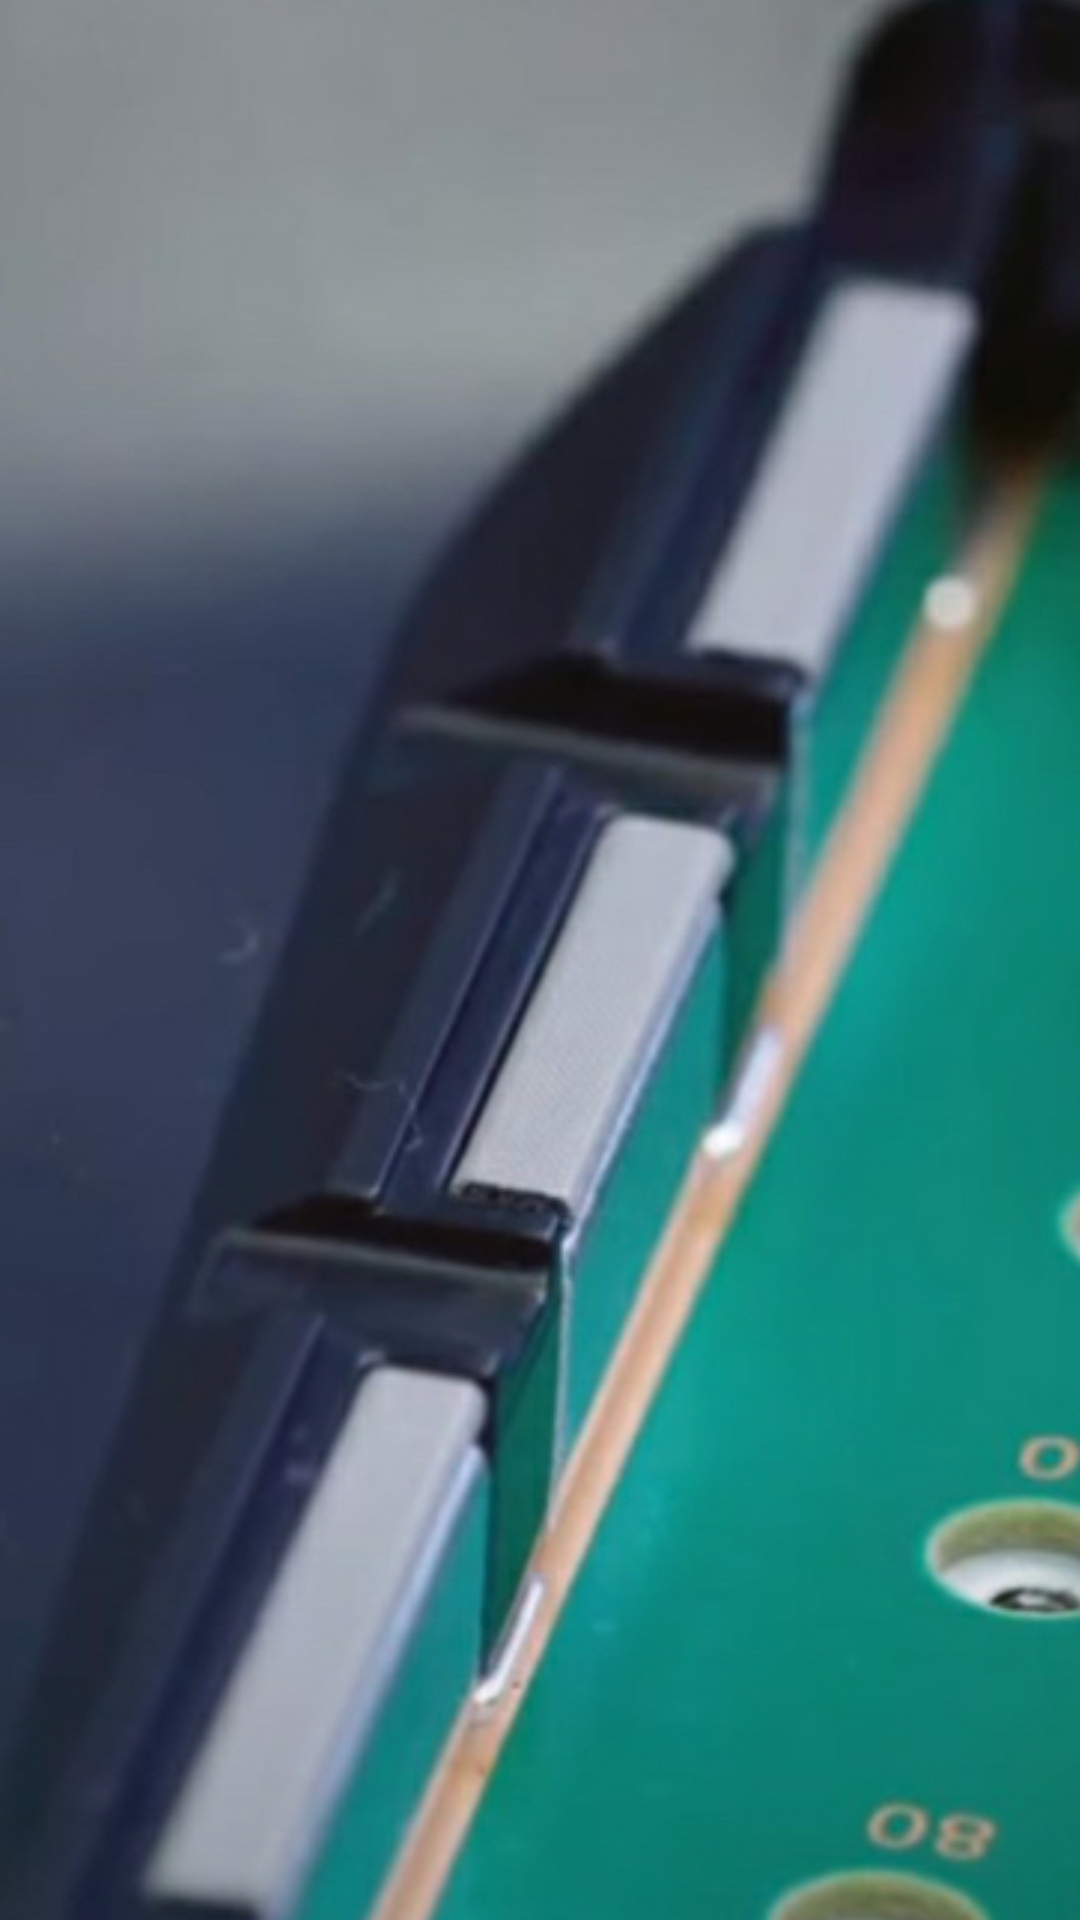 0md0N4w - DF「PS5は内蔵SSD逝ったら交換修理だし拡張SSDも冷えねーだろコレ」